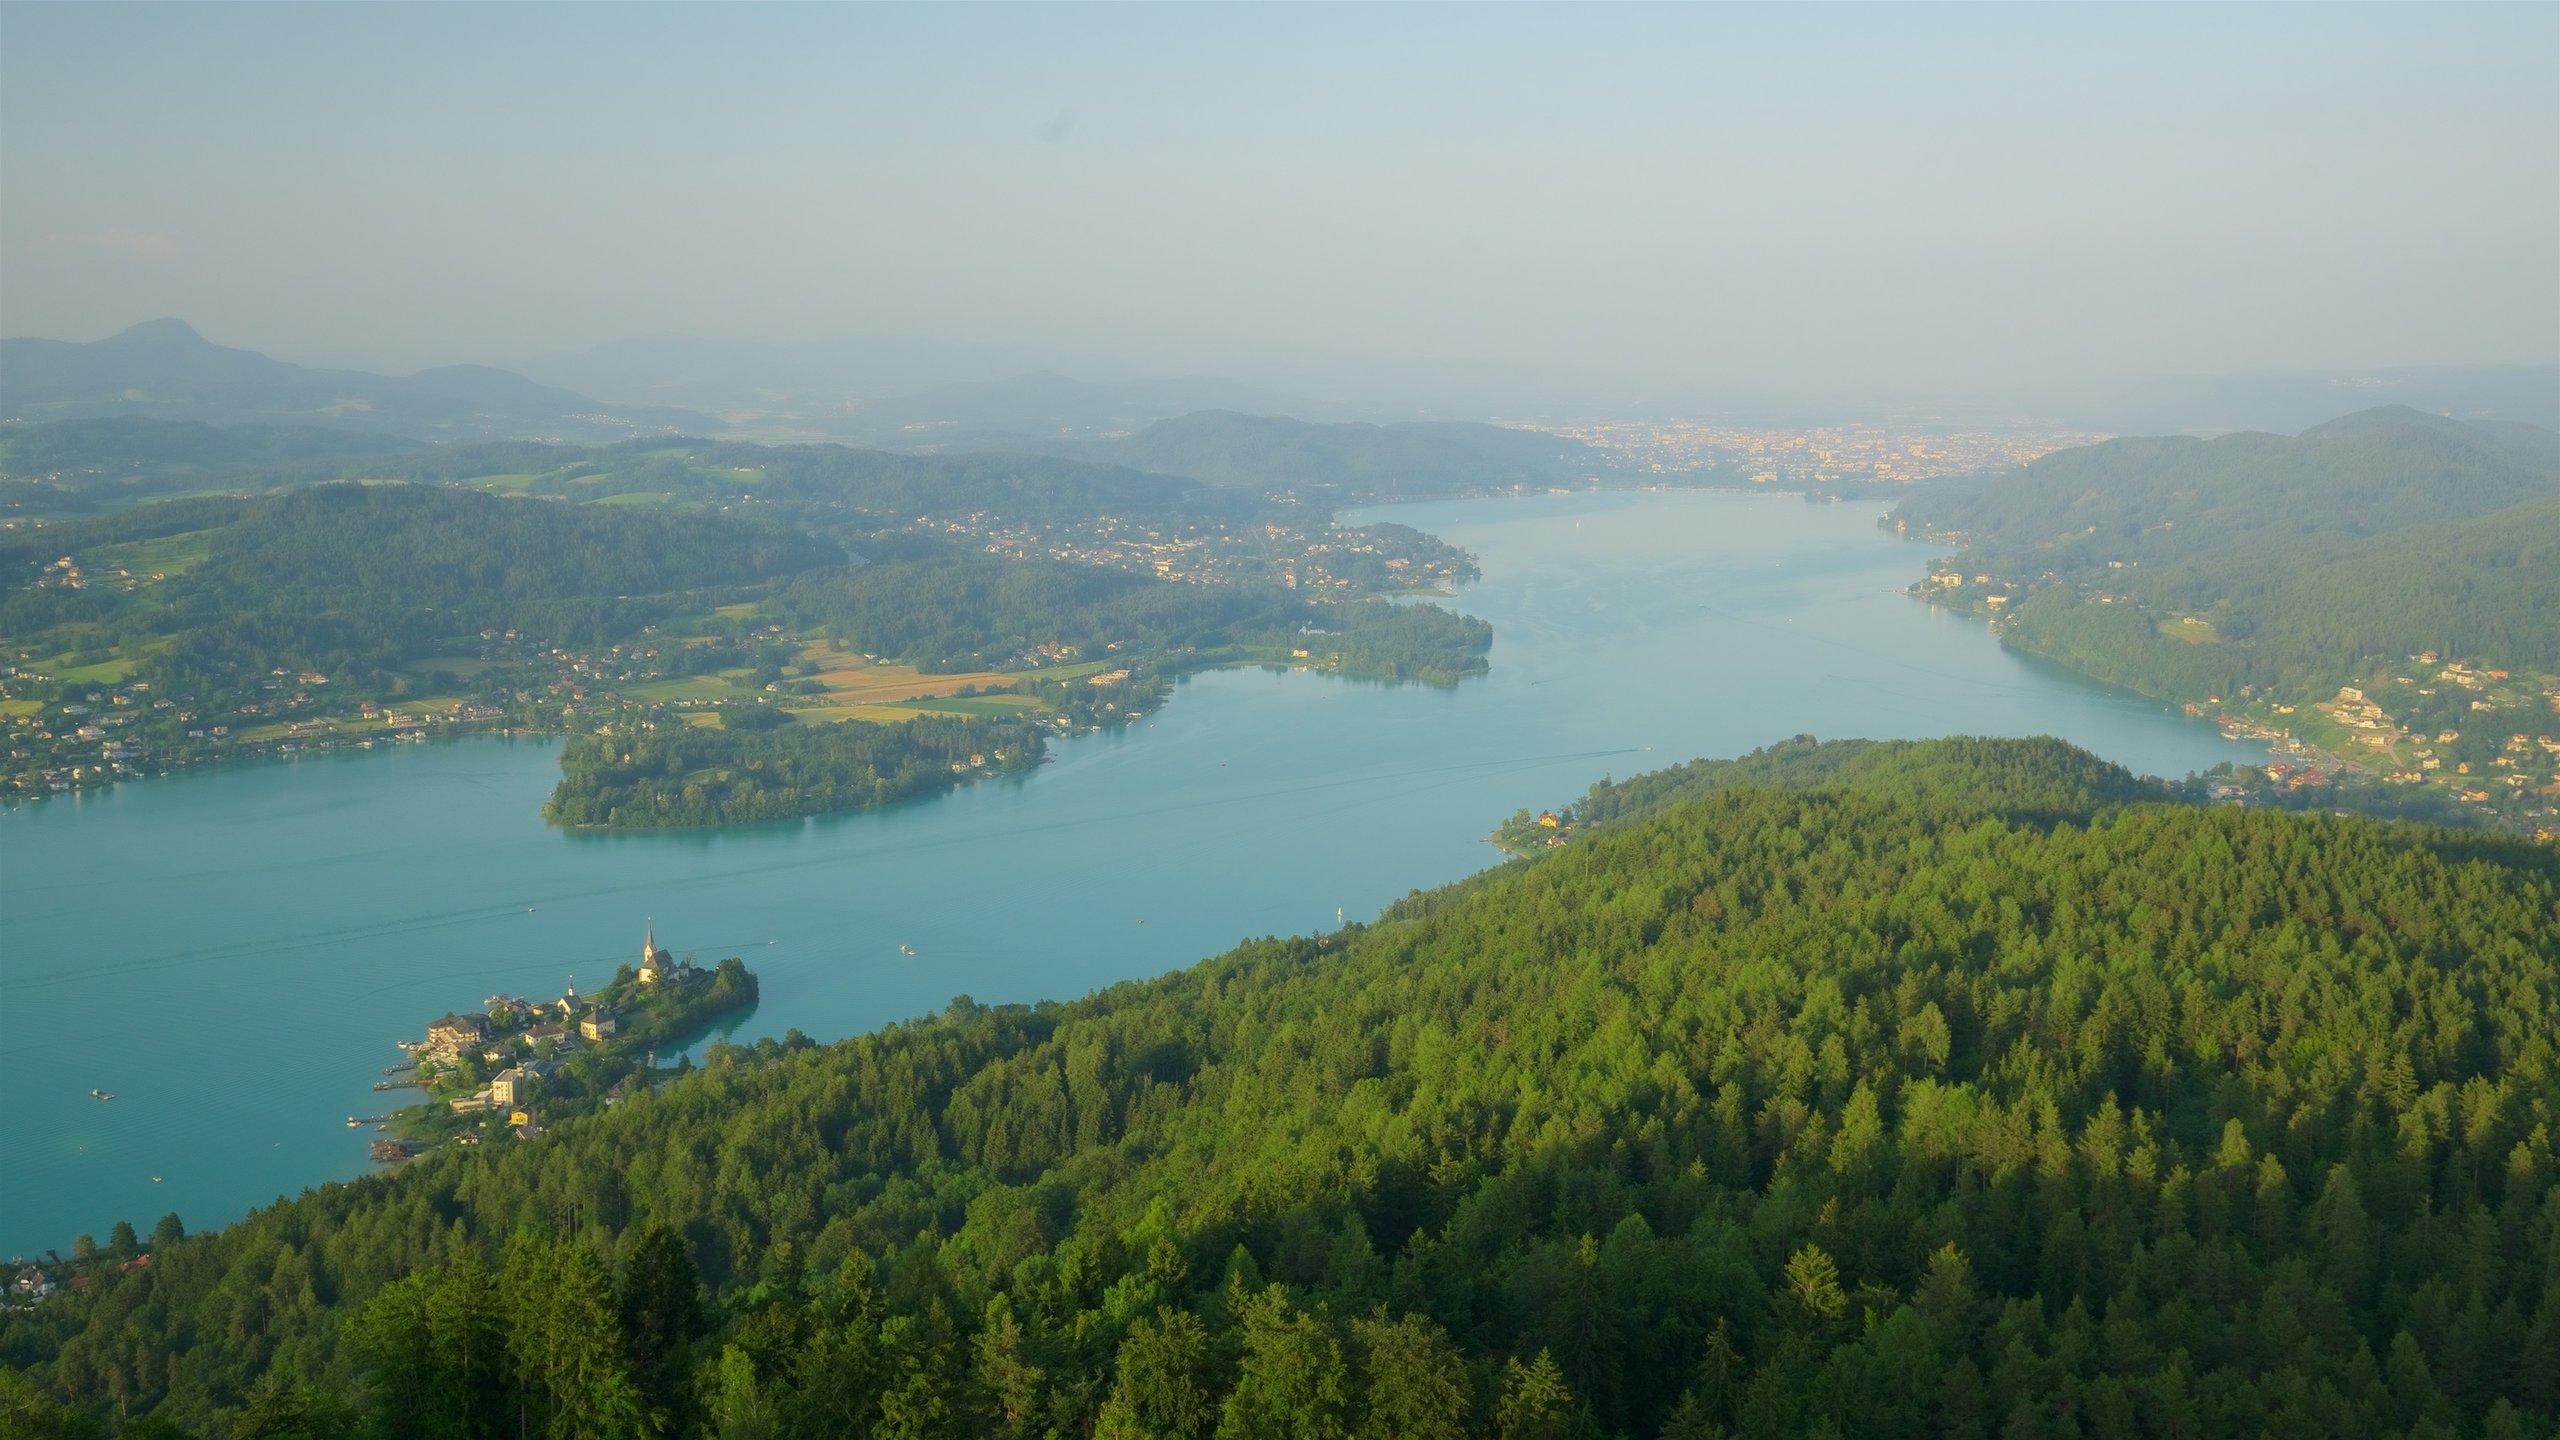 Klagenfurt-Land District, Carinthia, Austria